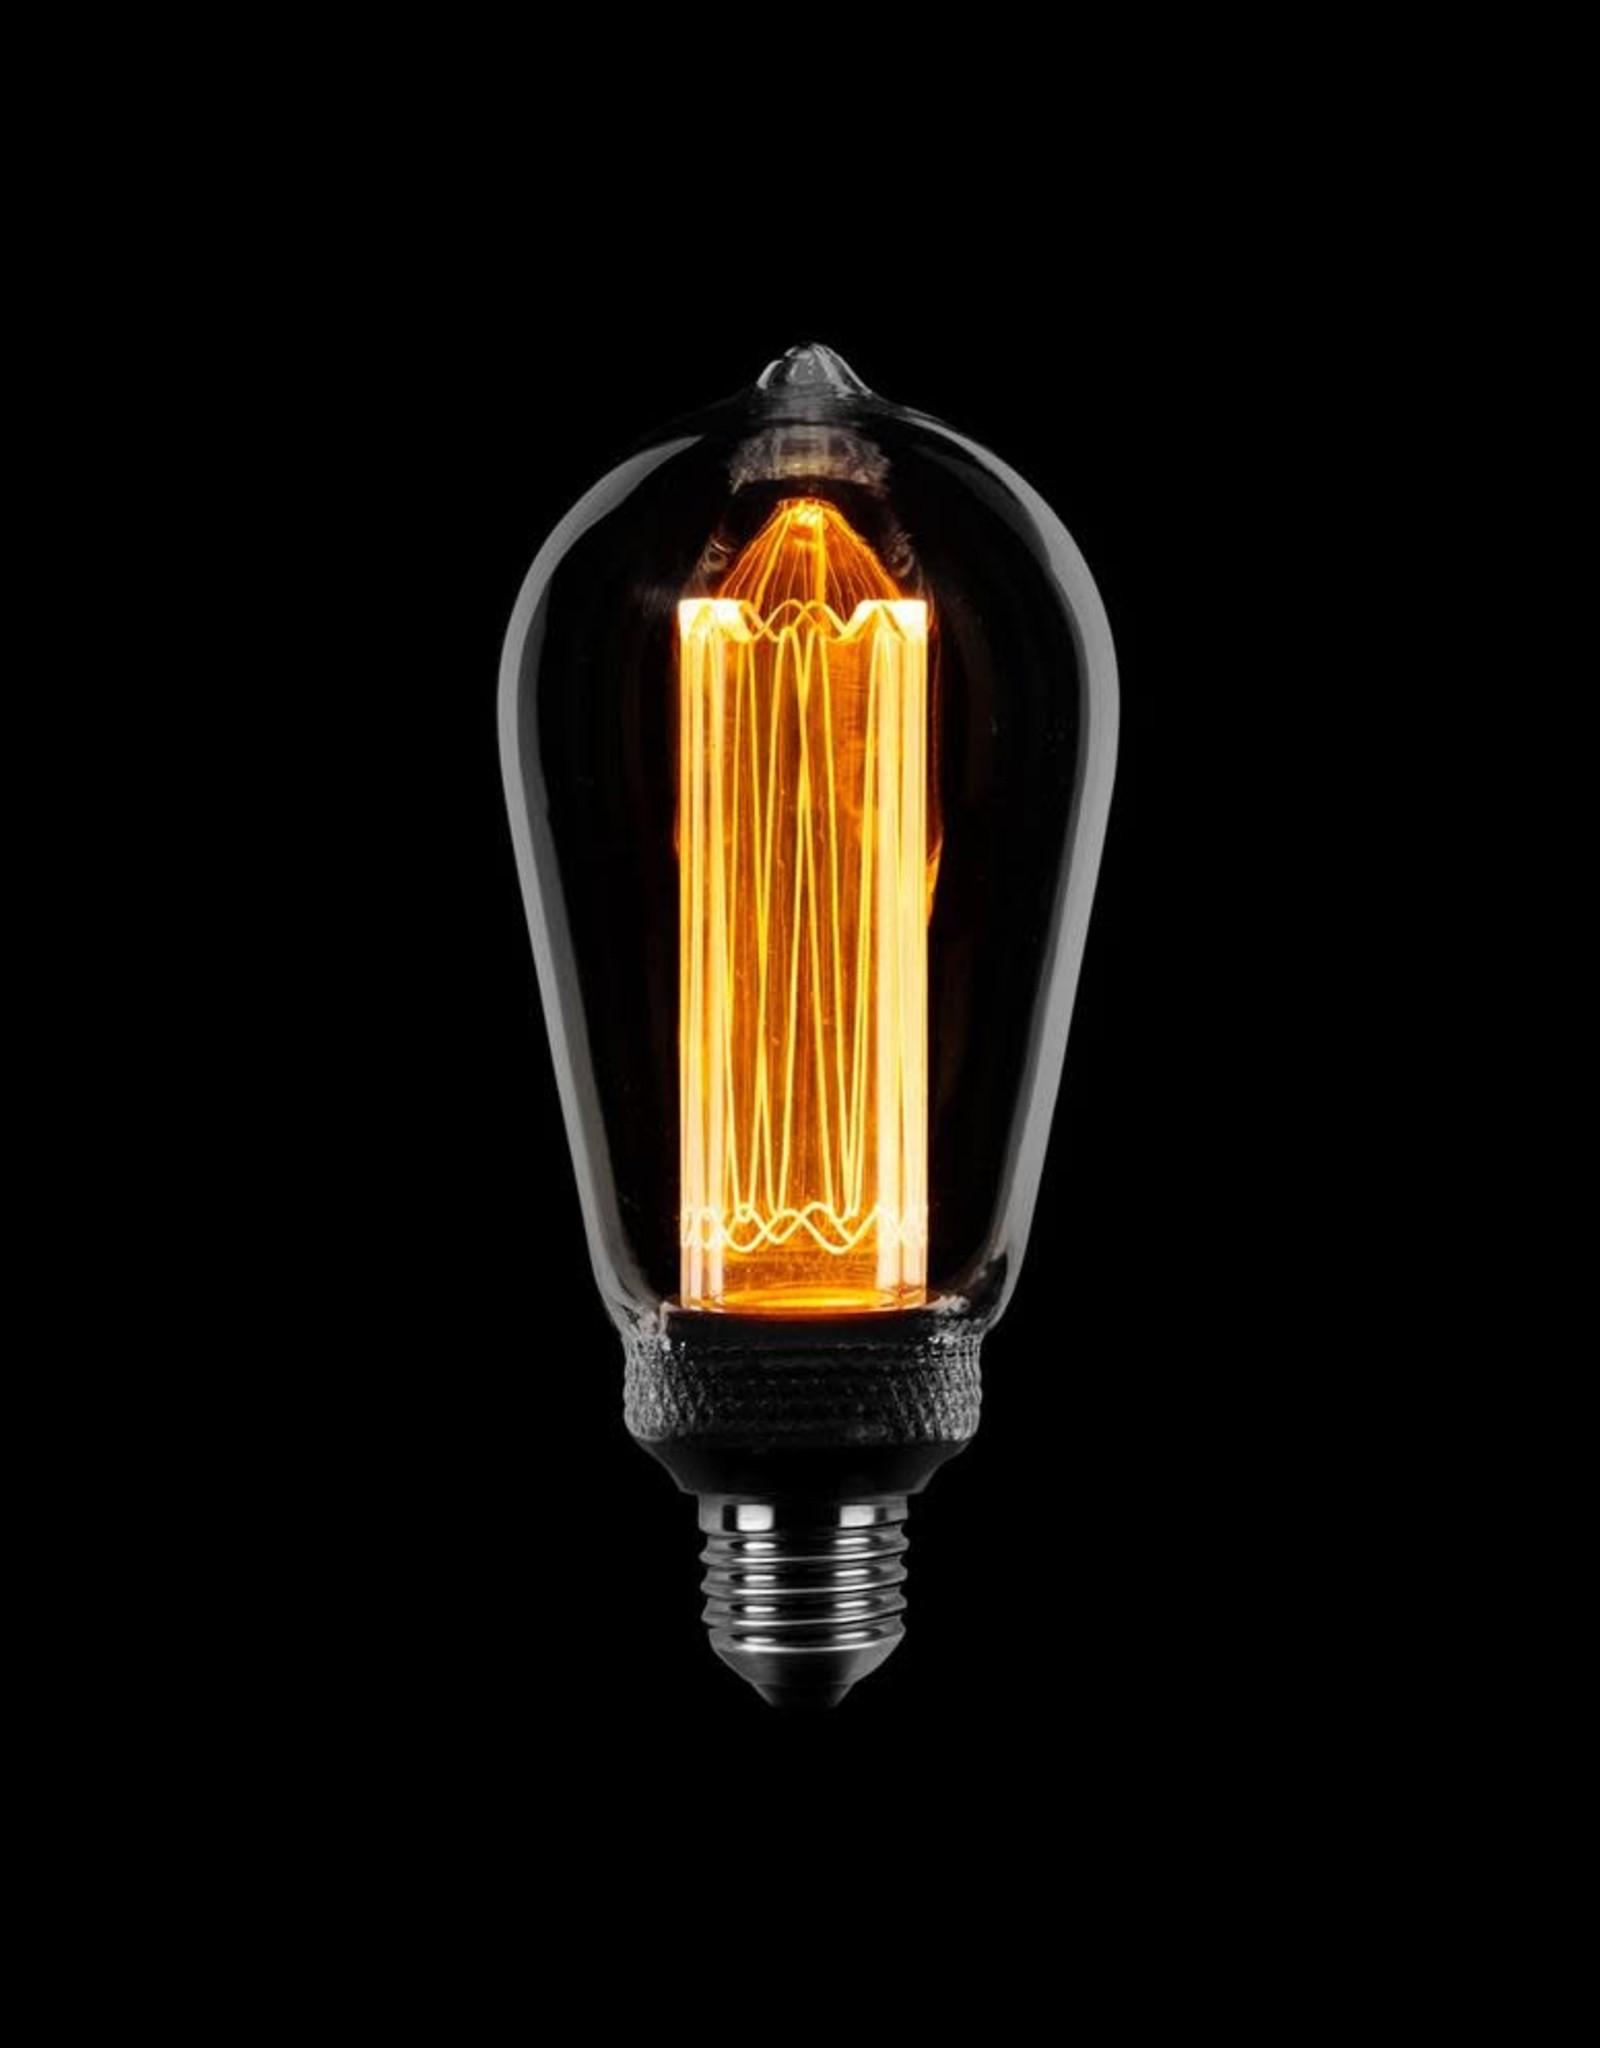 Lamp Edison kooldraad LED 3 stappen dimbaar smoke E27